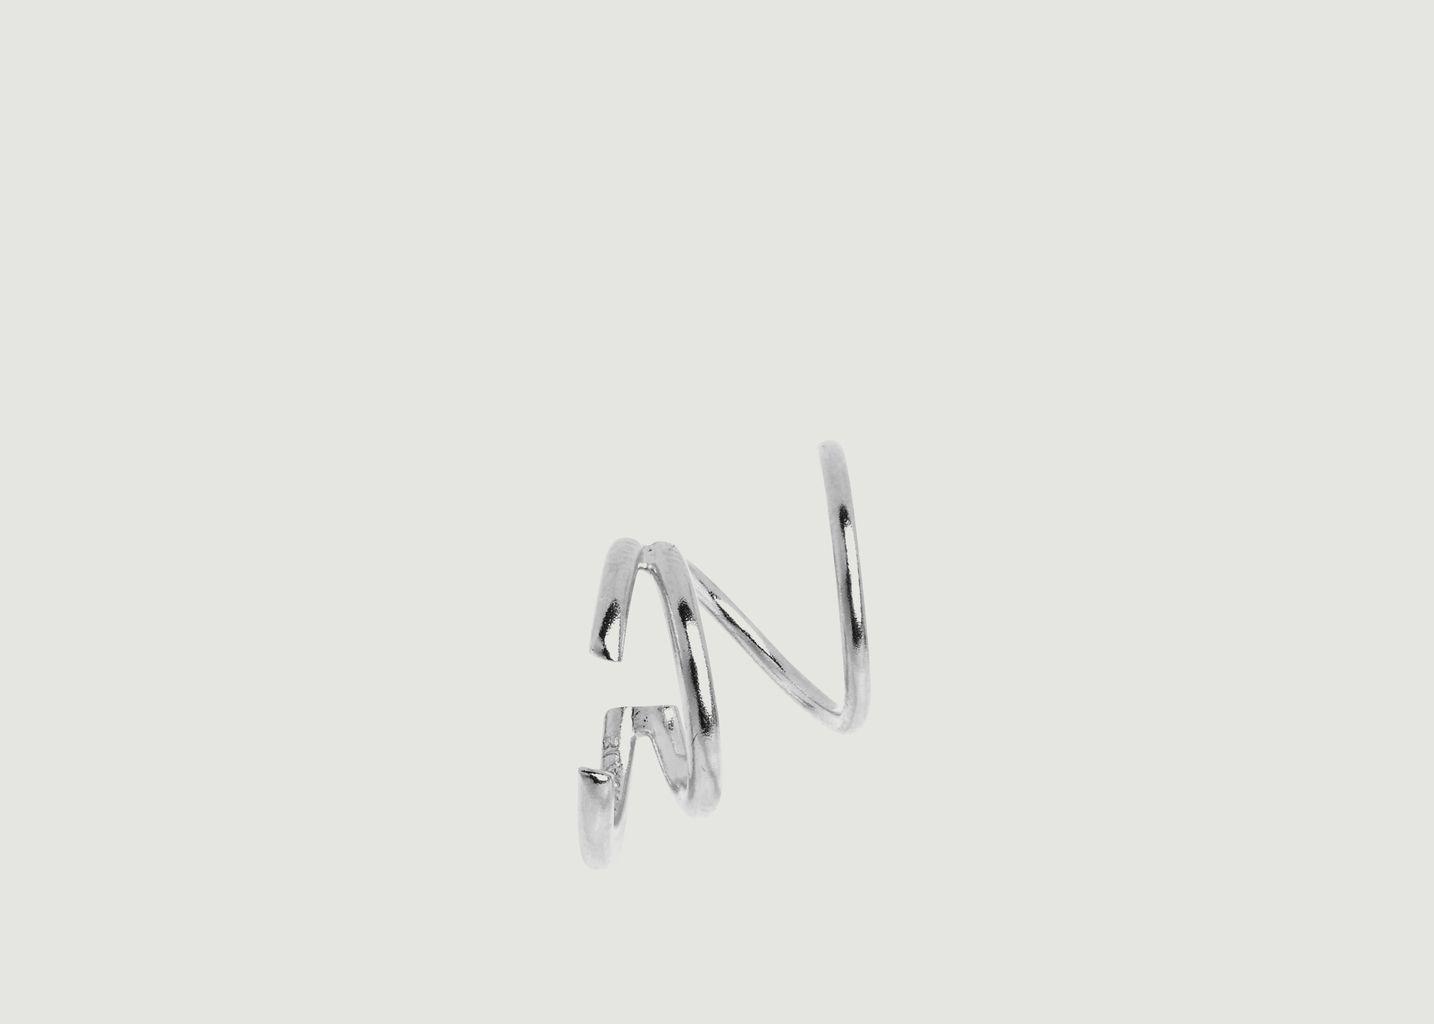 Boucle d'Oreille Bell Twirl Gauche - Maria Black